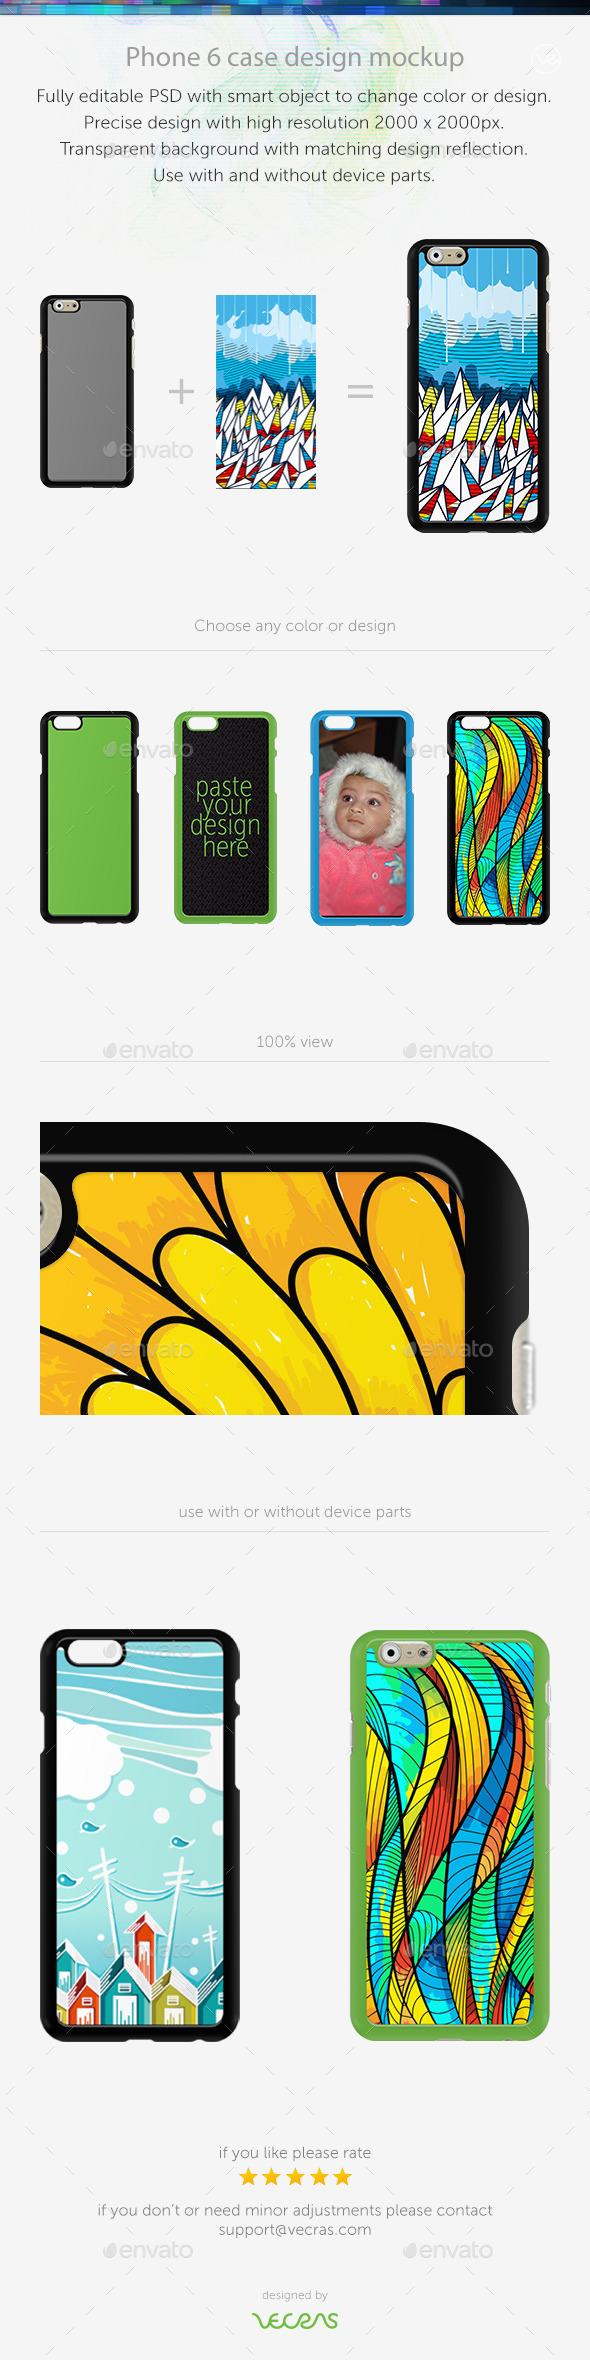 Phone 6 Sticker Case Design Mockup